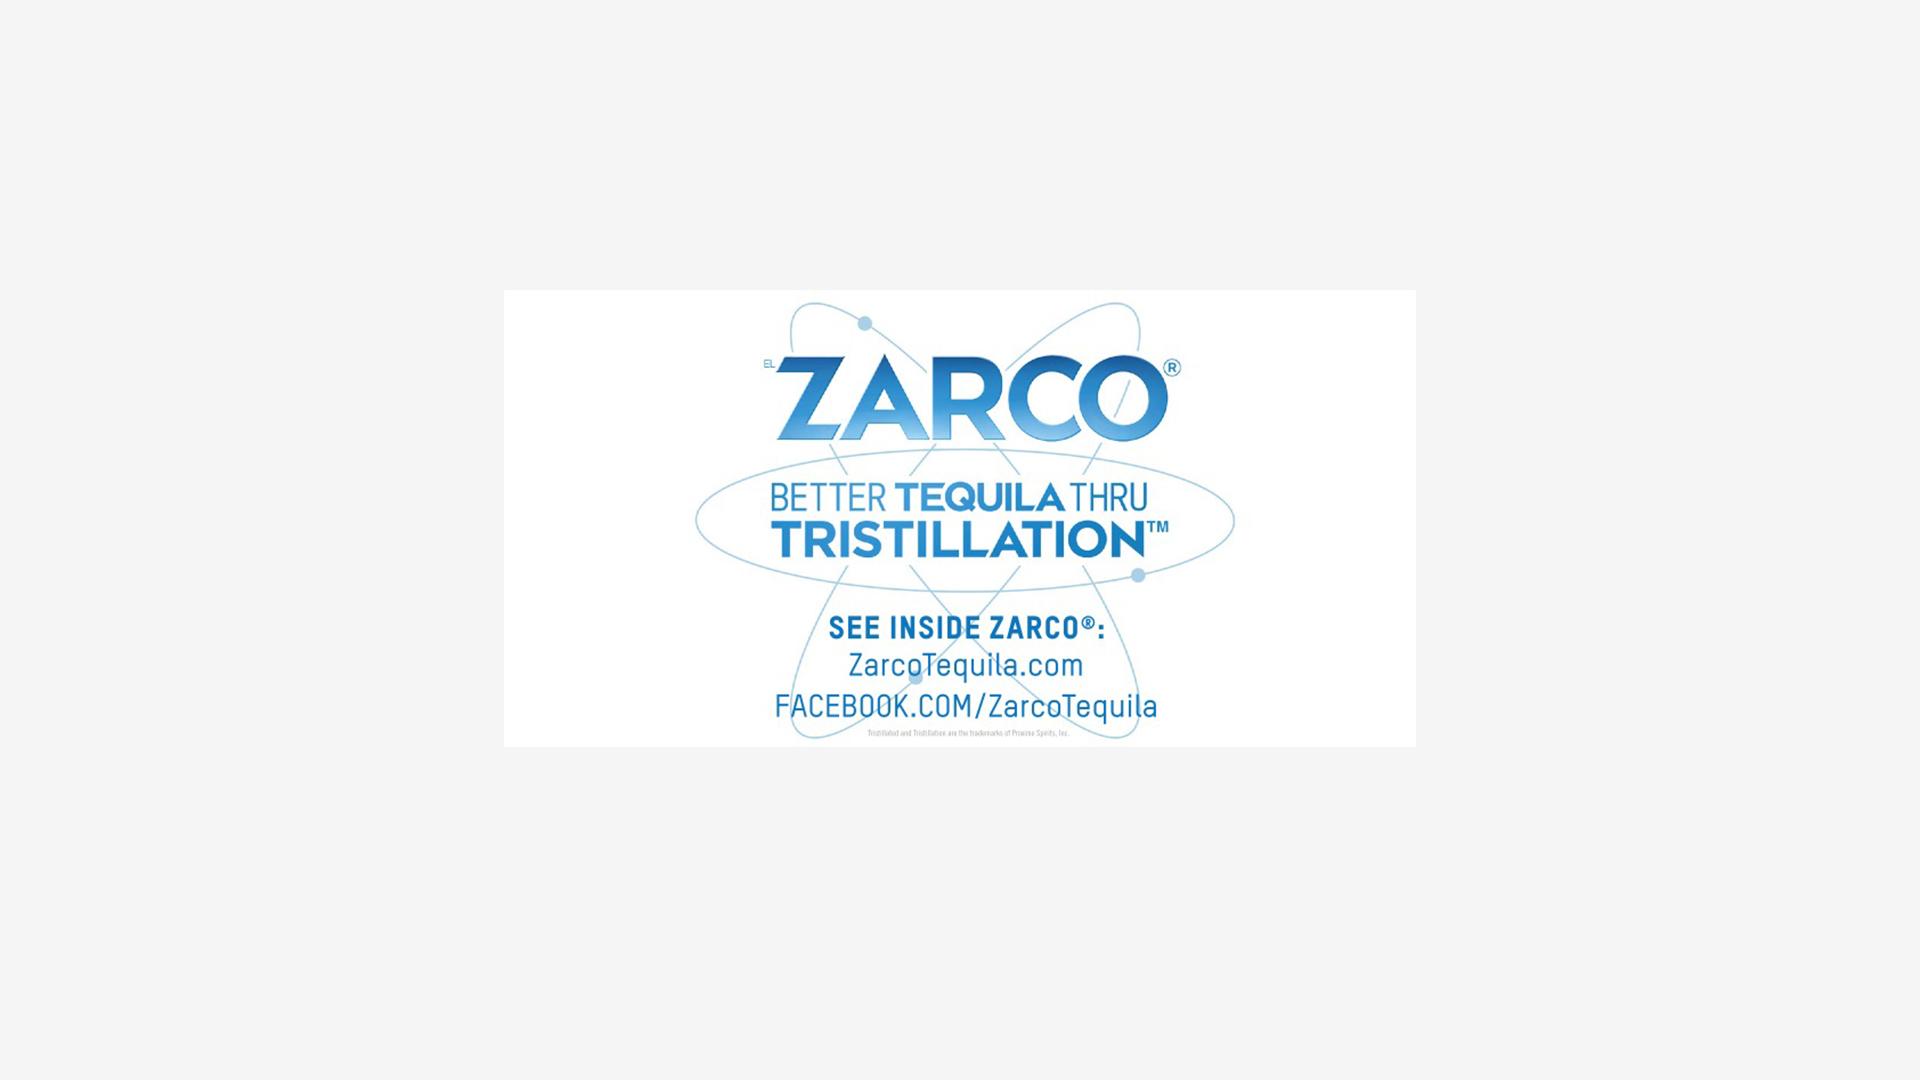 Zarco Activation